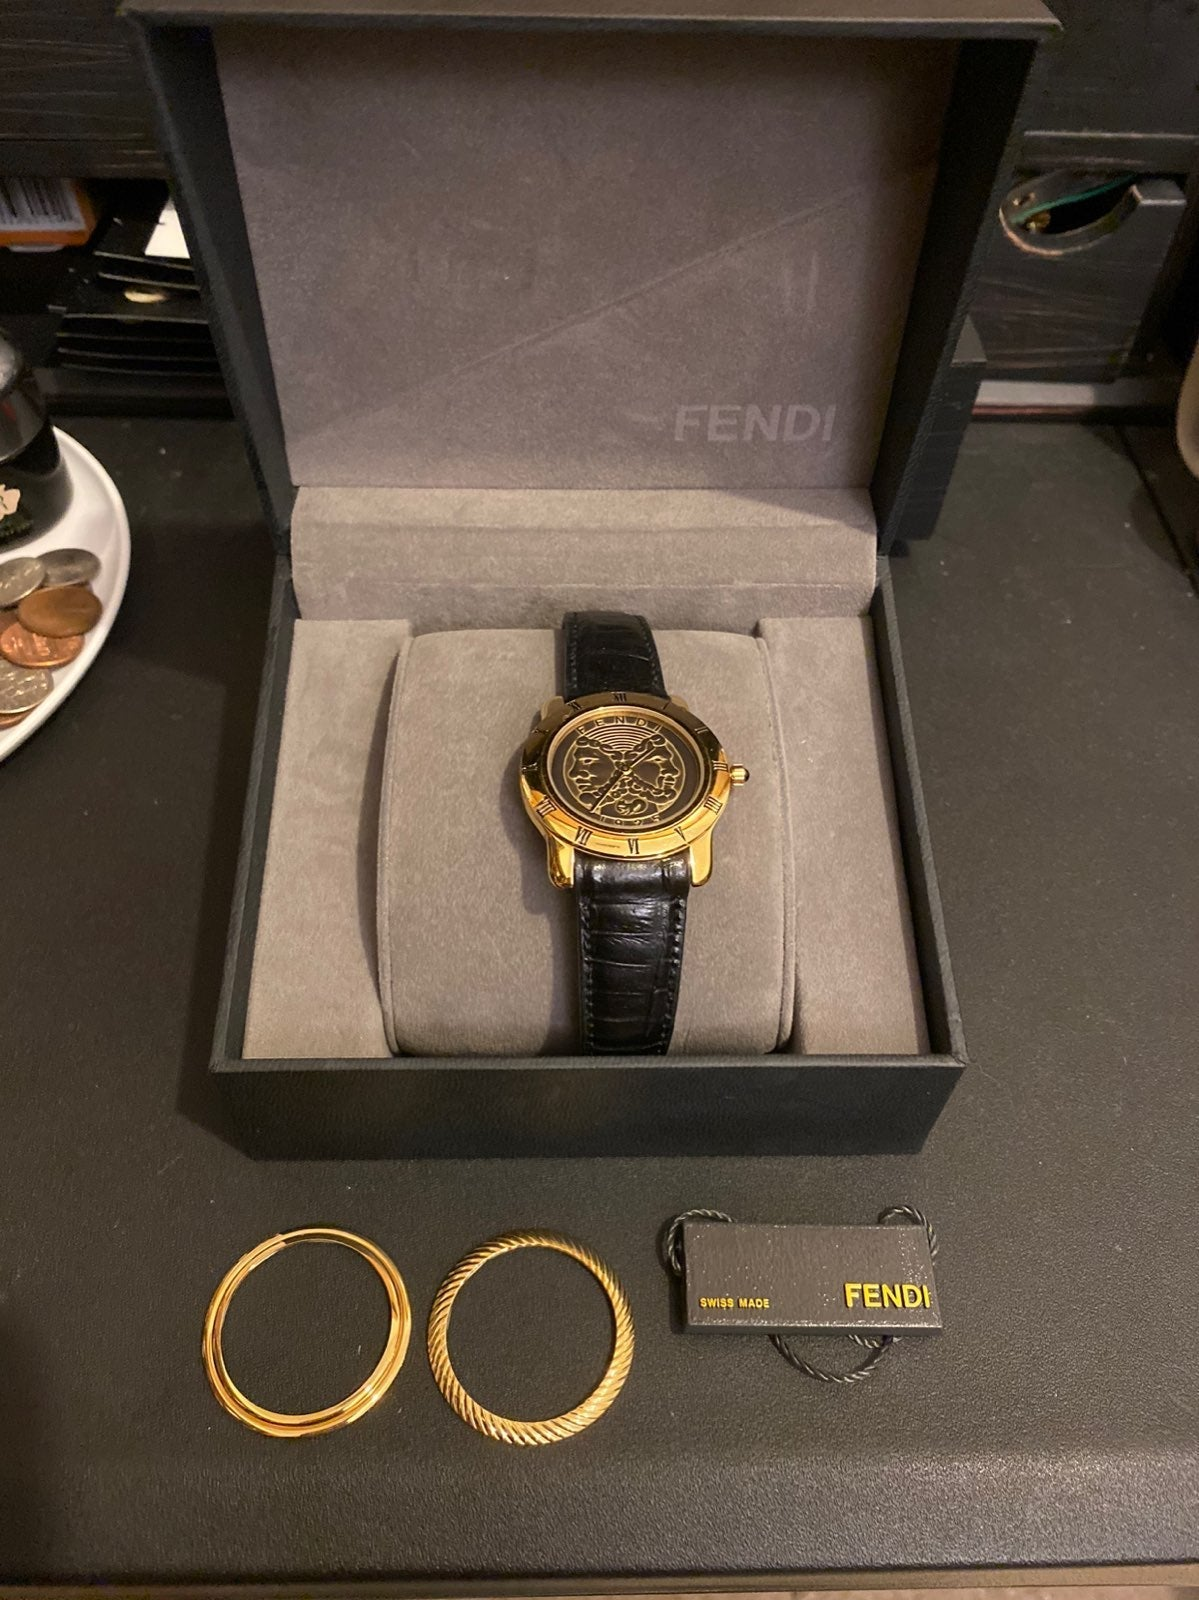 Authentic Fendi Swiss made watch